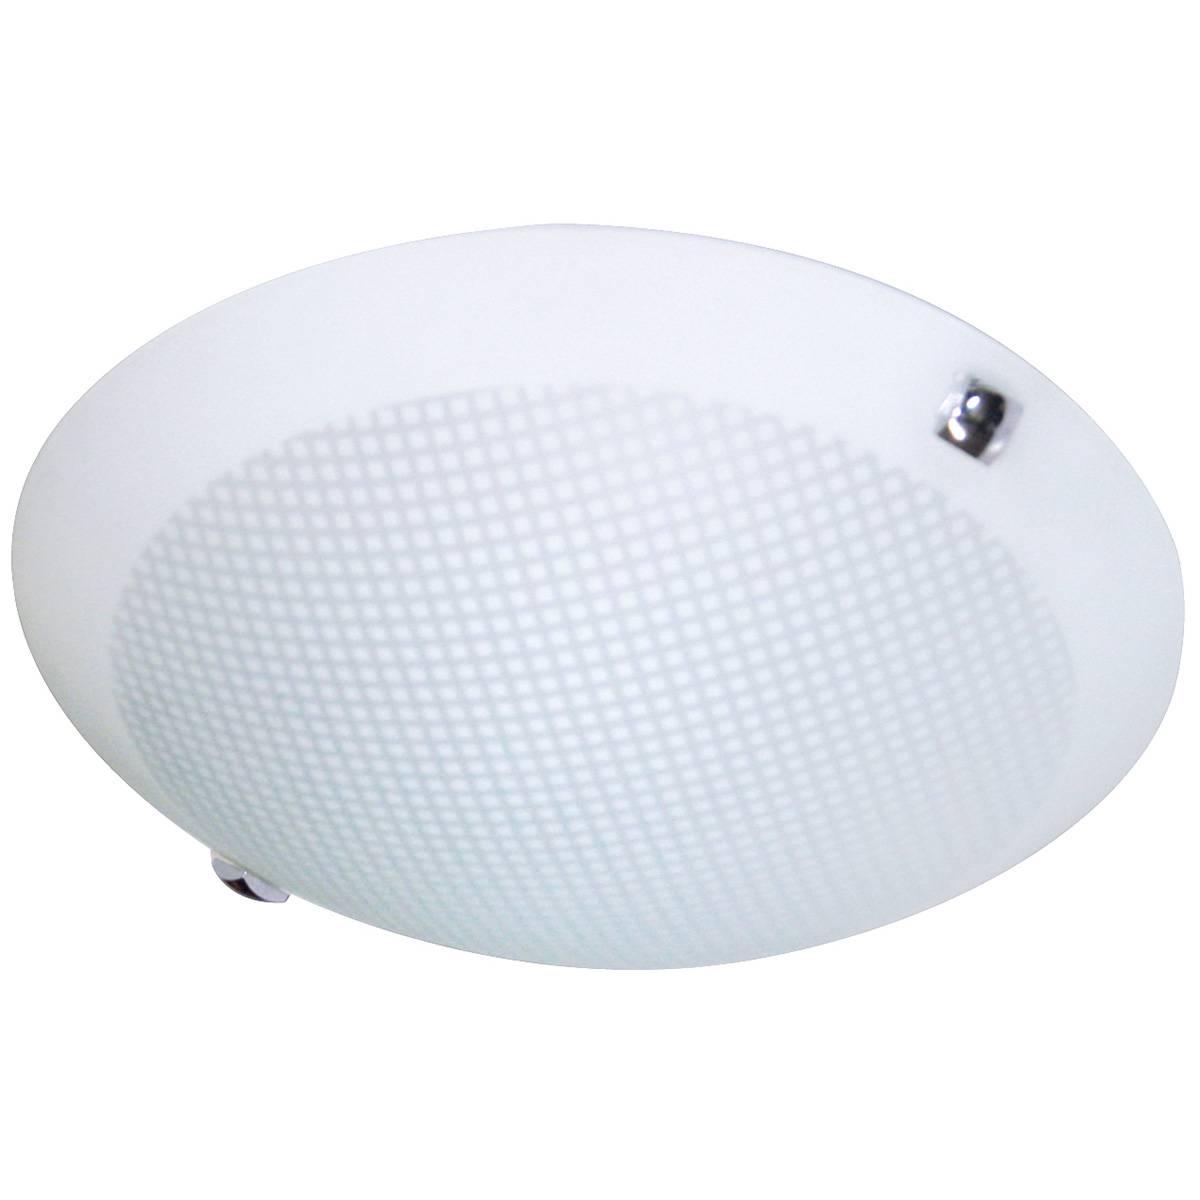 Plafon Nuvem Vidro Fosco 35cm 2 Lamp. E-27 Max 60w Branco Redondo 05 Unidades